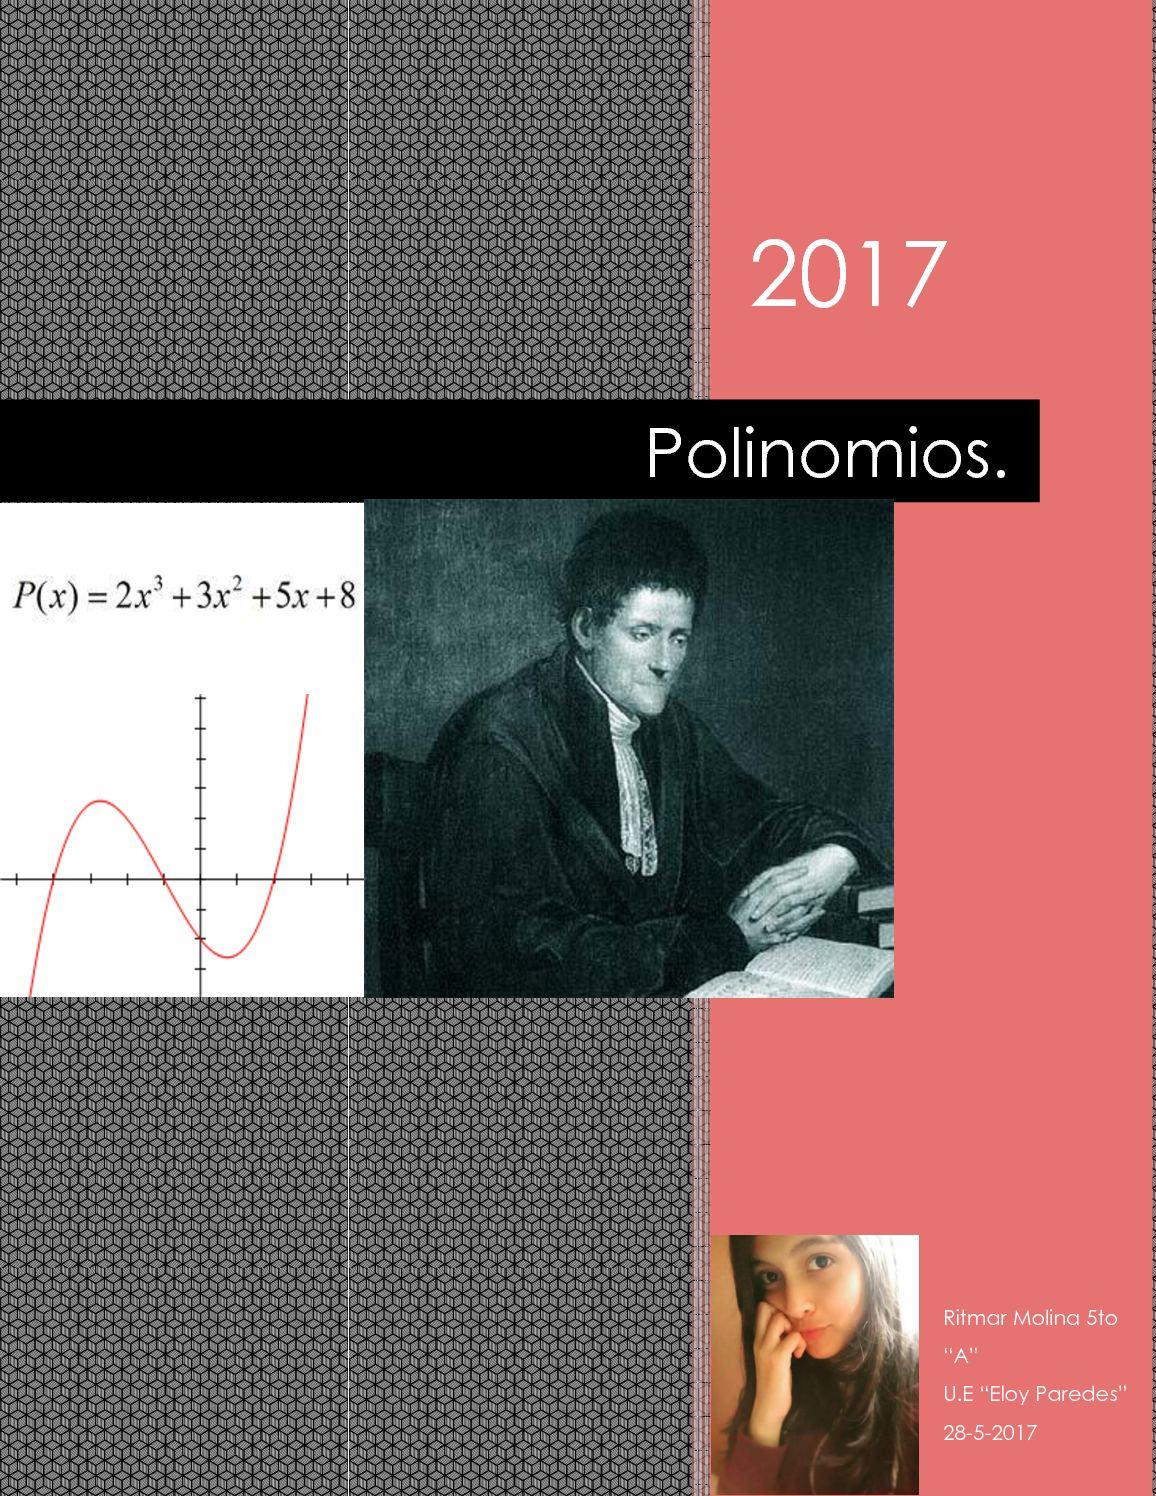 Revista - Ritmar Molina 5to A